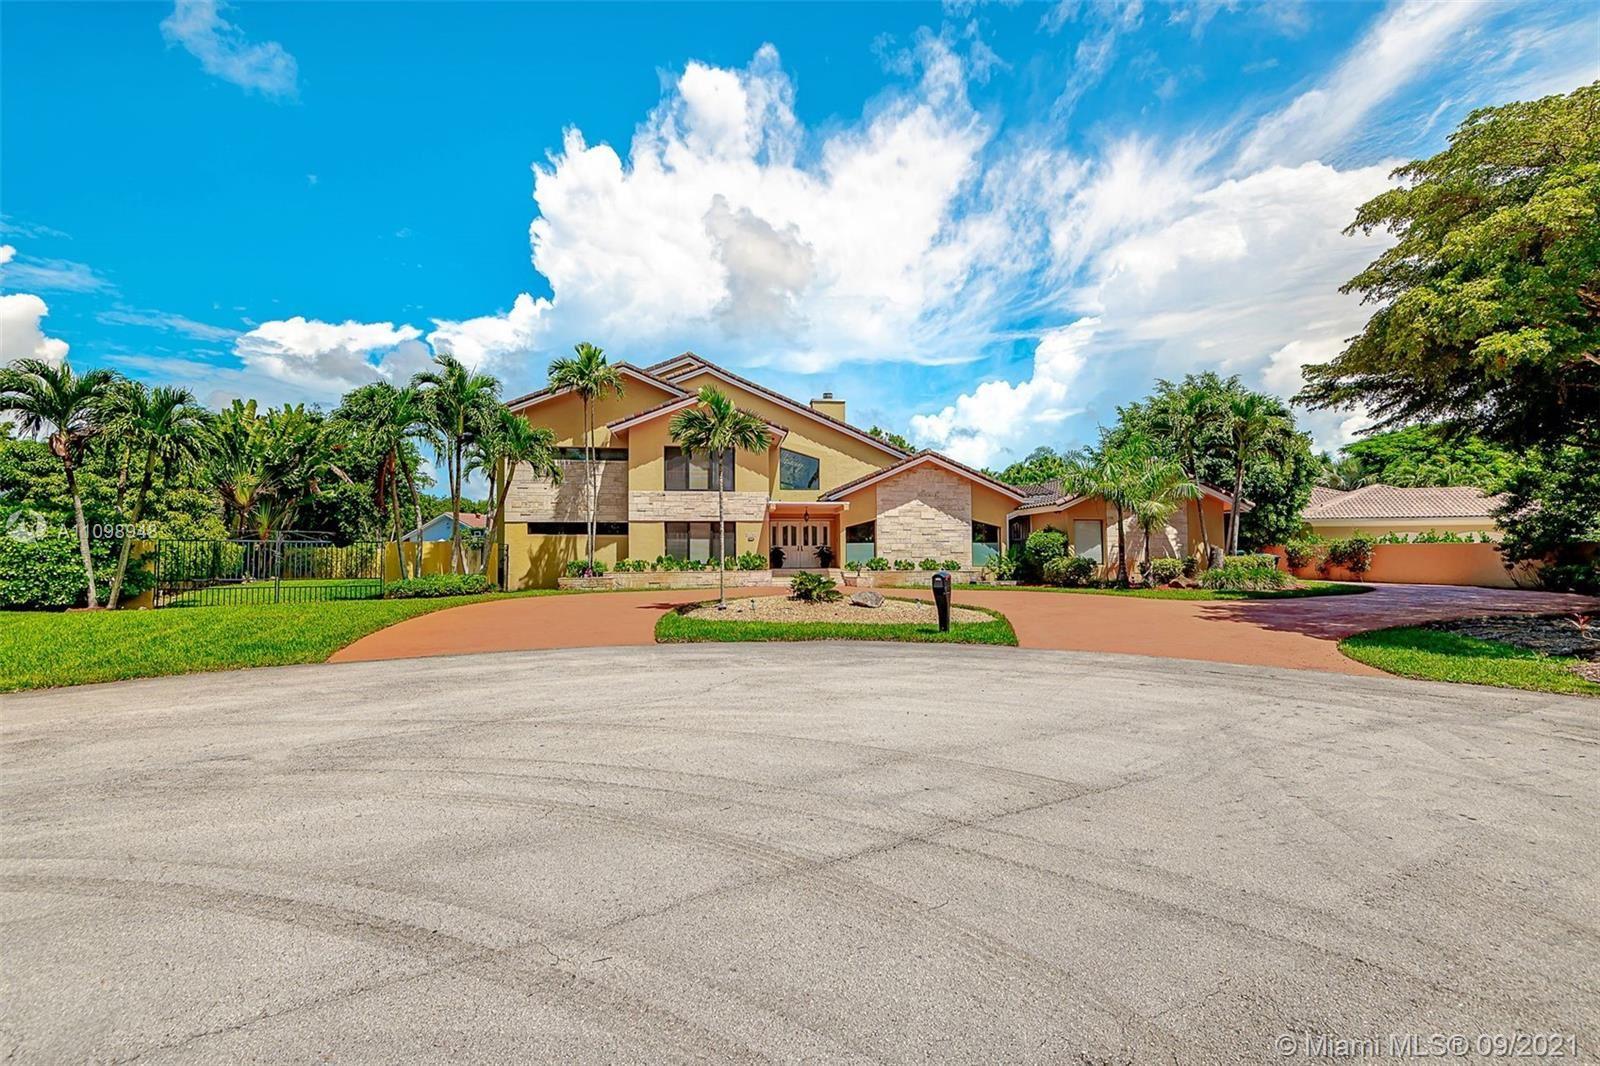 9301 SW 103rd St, Miami, FL 33176 - #: A11098948